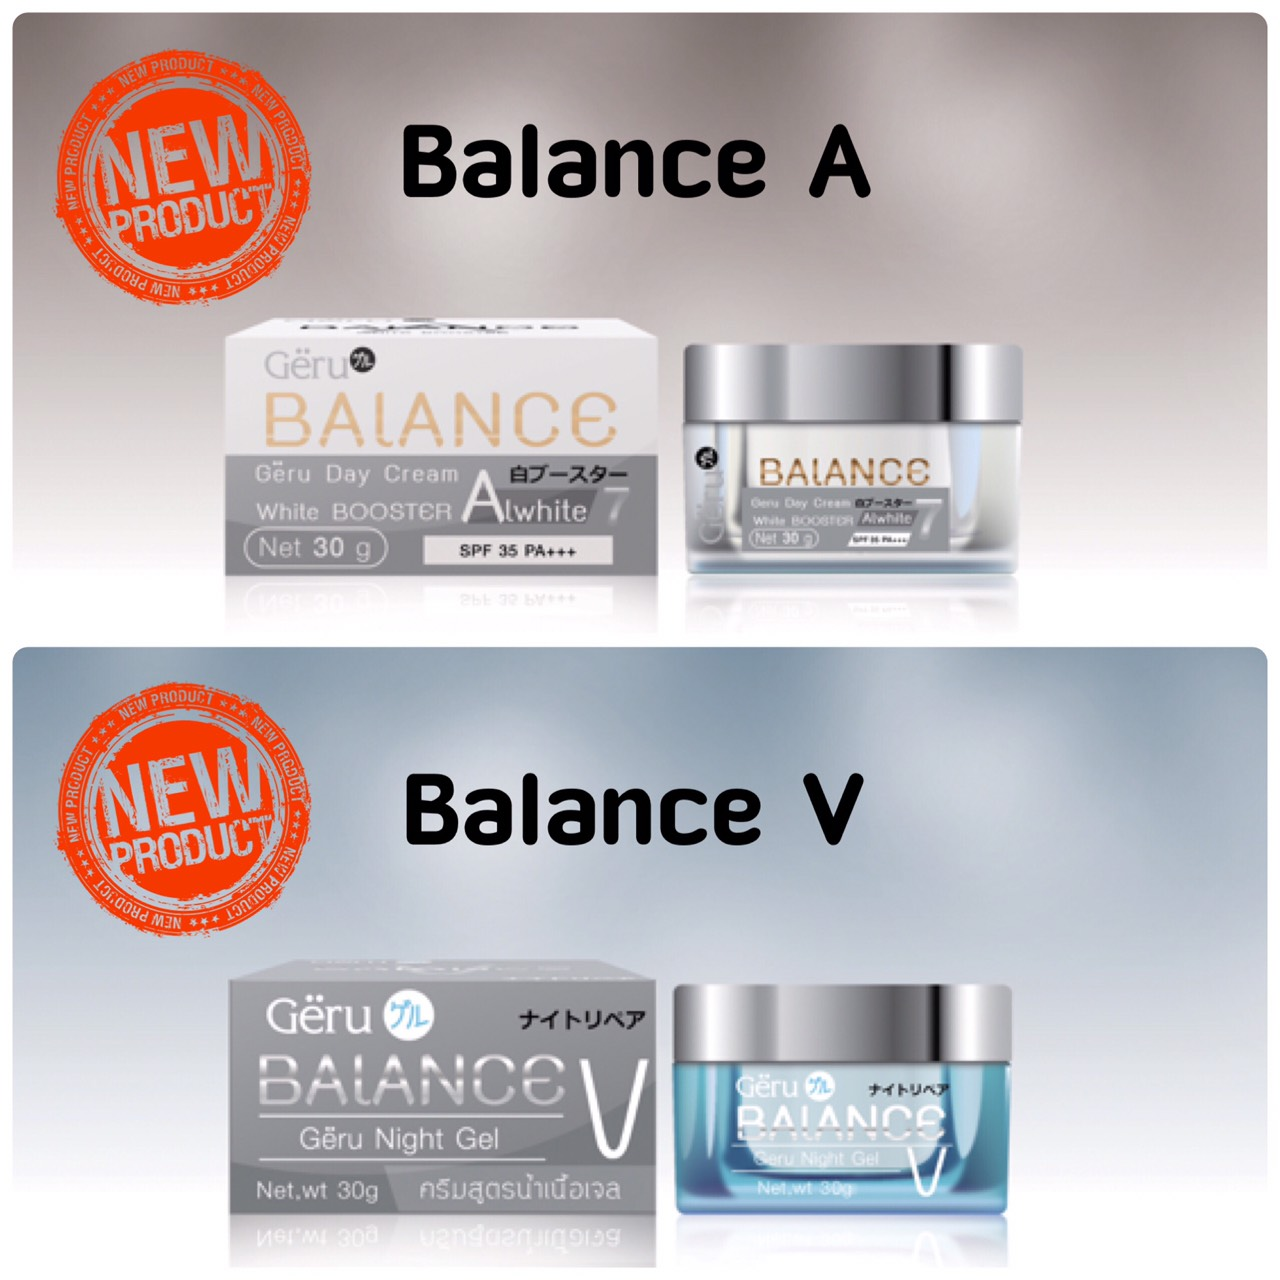 BalanceA ลดเลือนริ้วรอยและจุดด่างดำ & BalanceV ยกกระชับใบหน้า